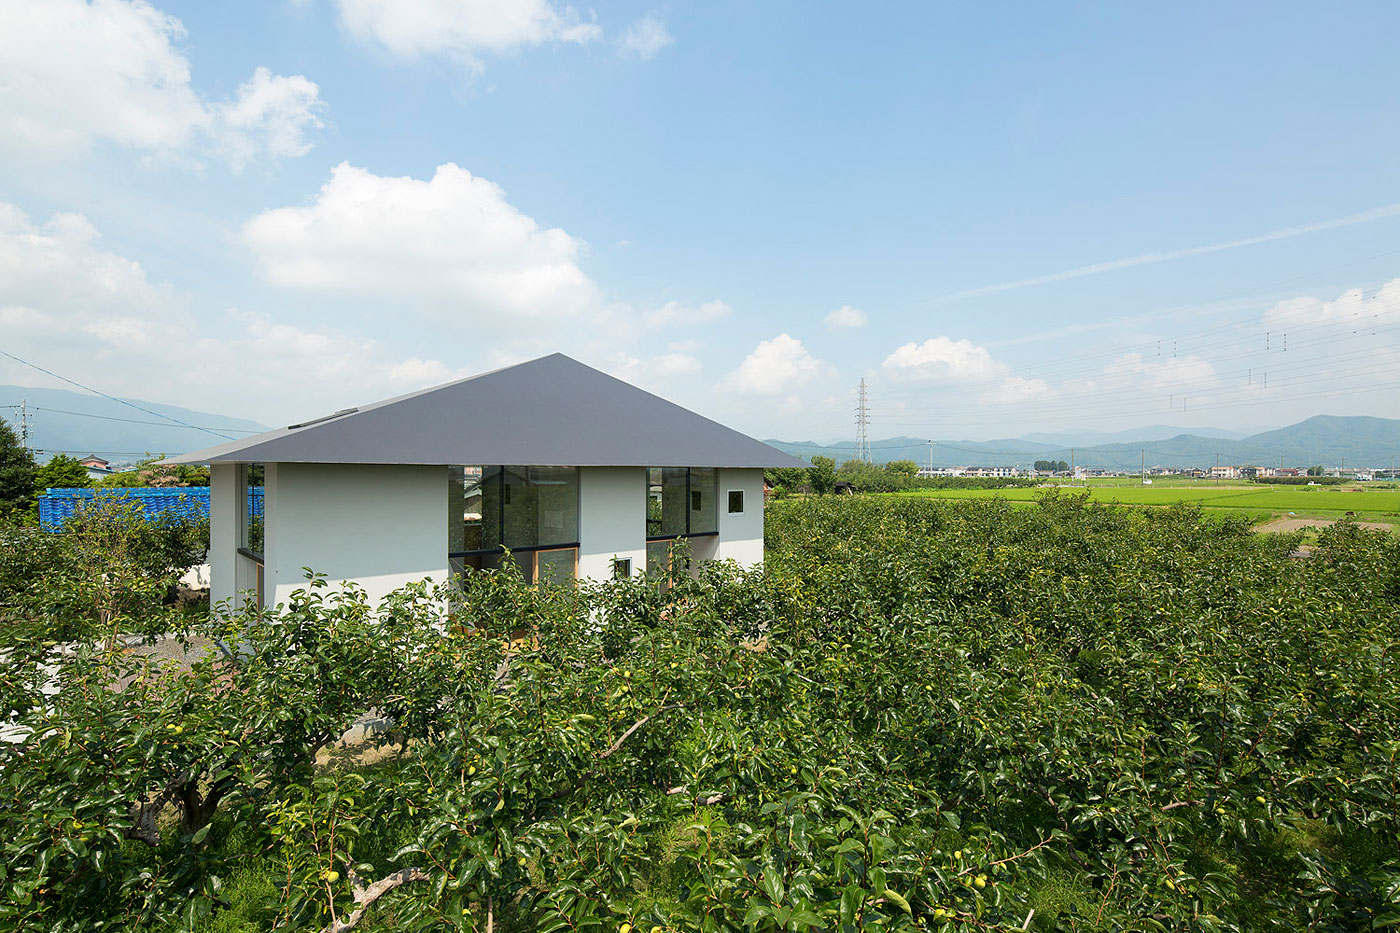 El huerto japonés que inspiró una casa unifamiliar